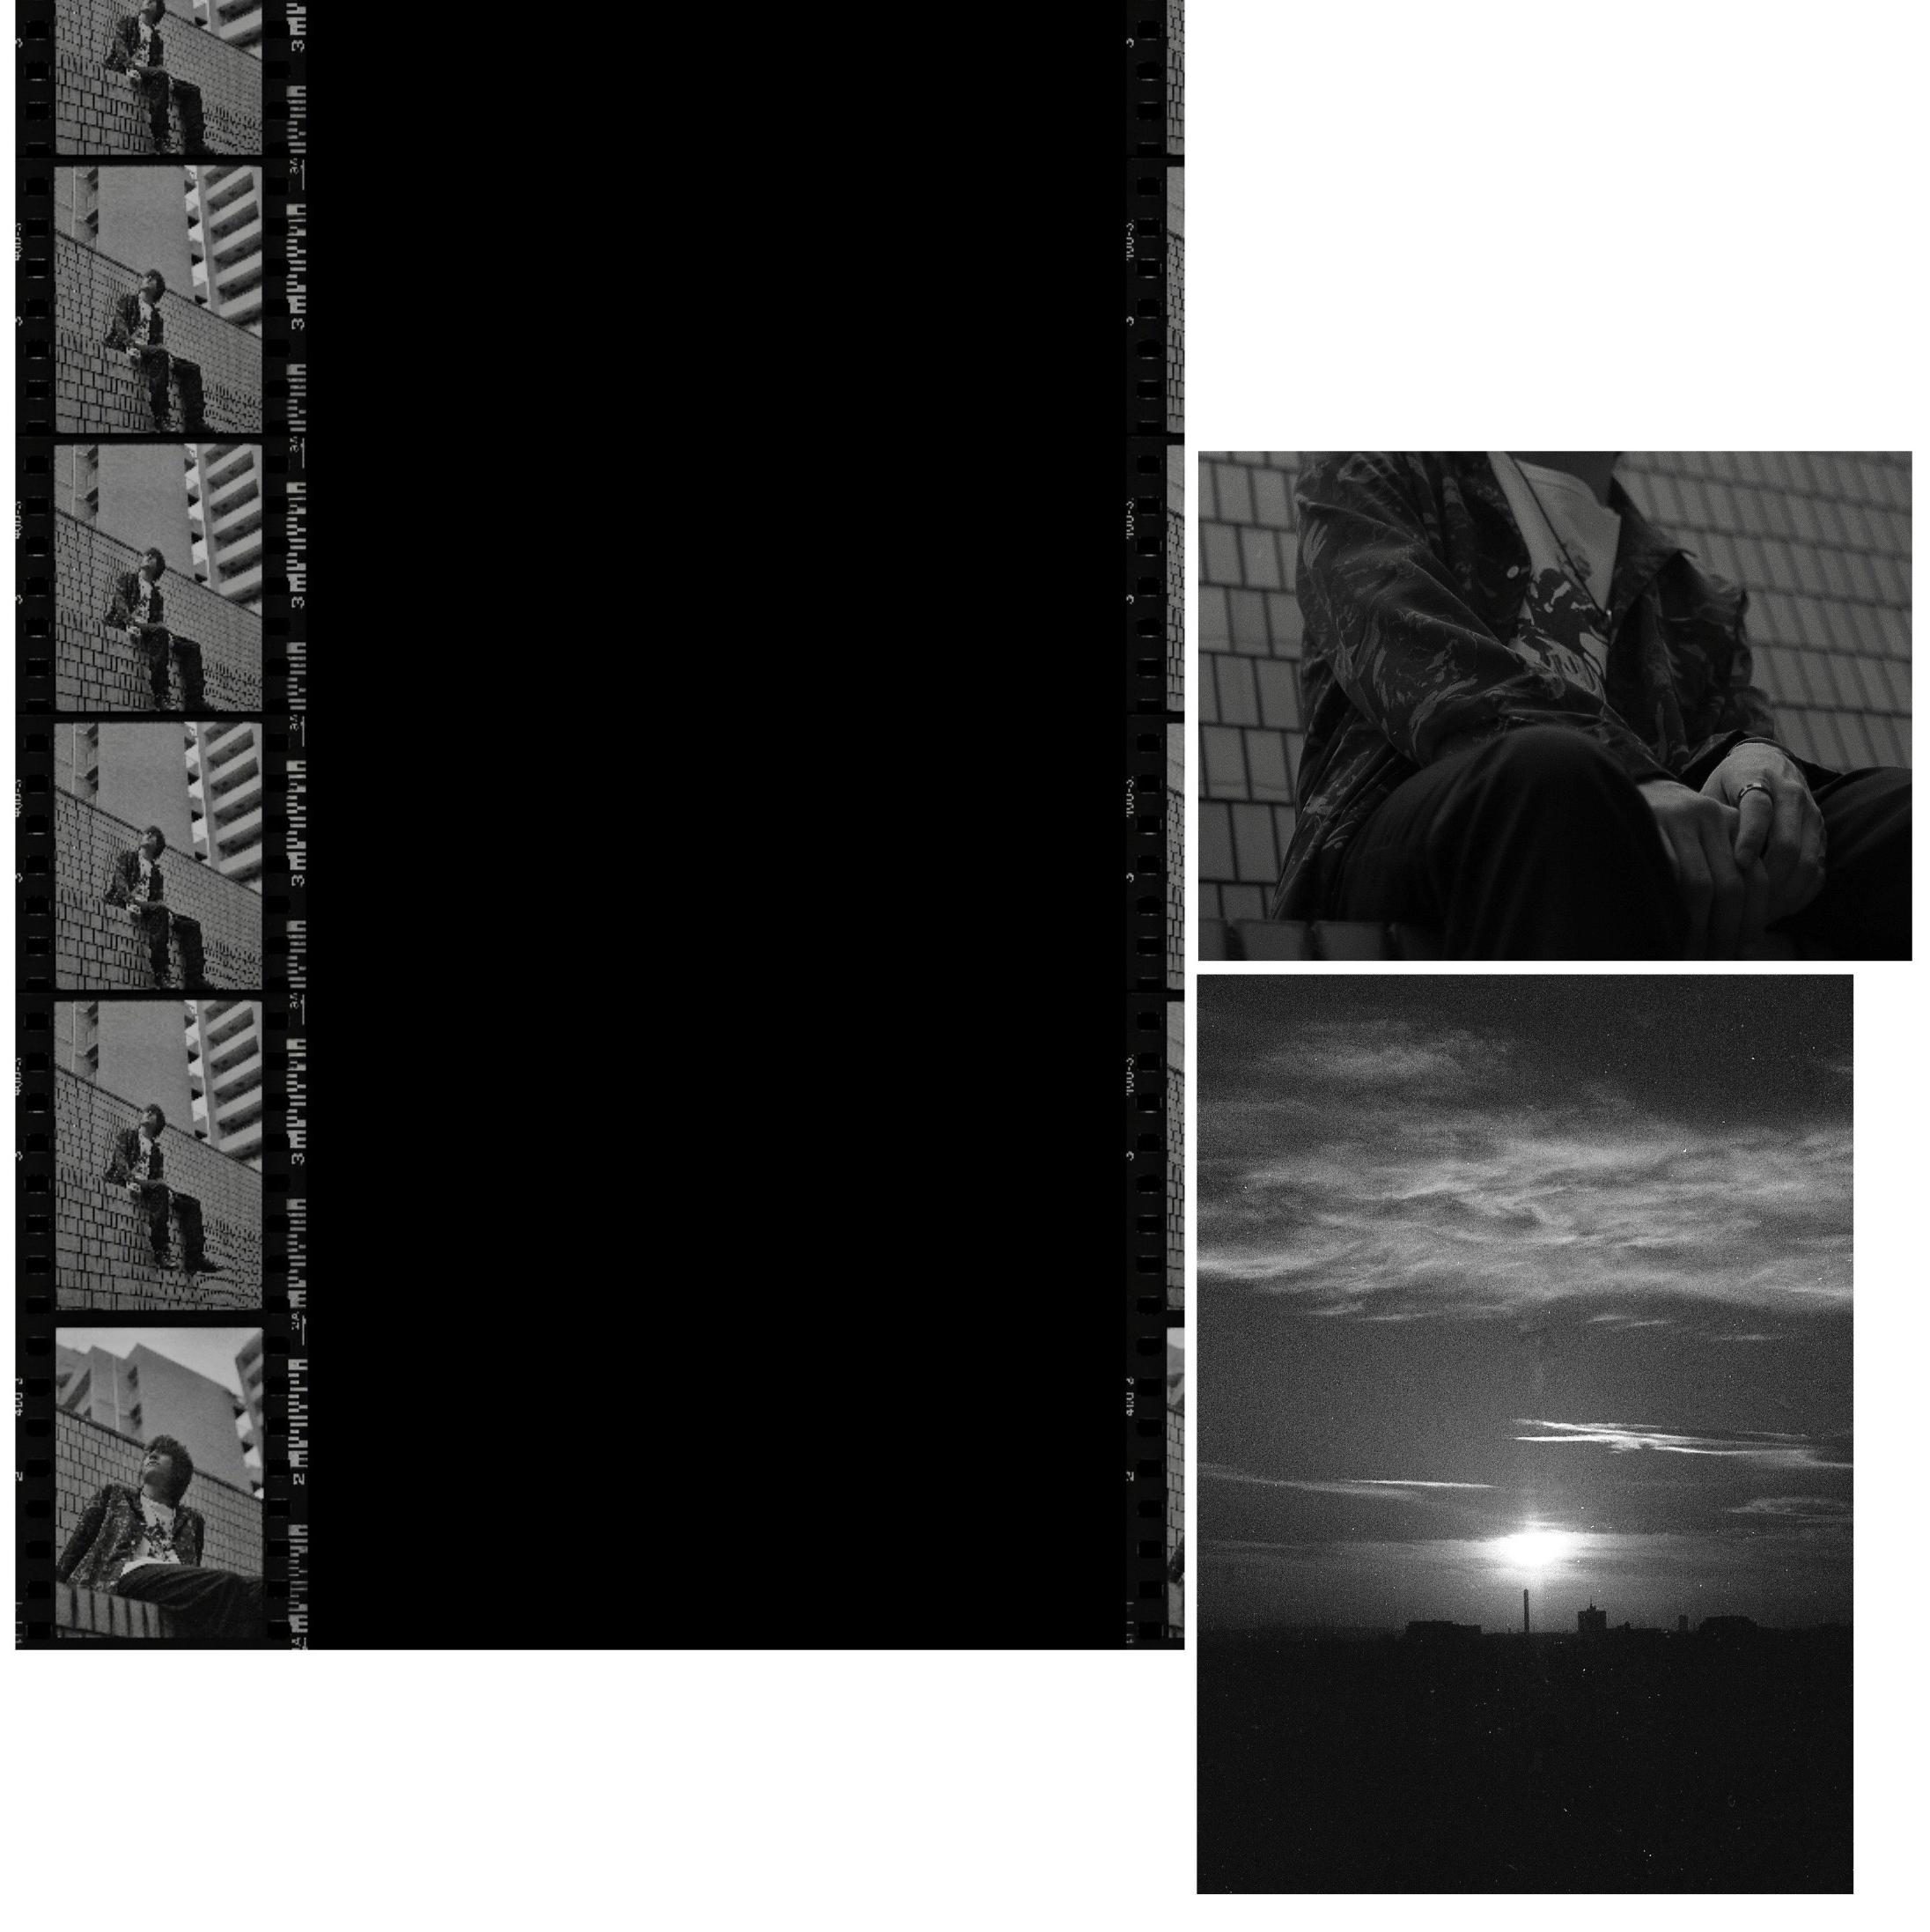 Lennycodefiction,レニーコードフィクション,片桐航,井崎竜太朗,写真家